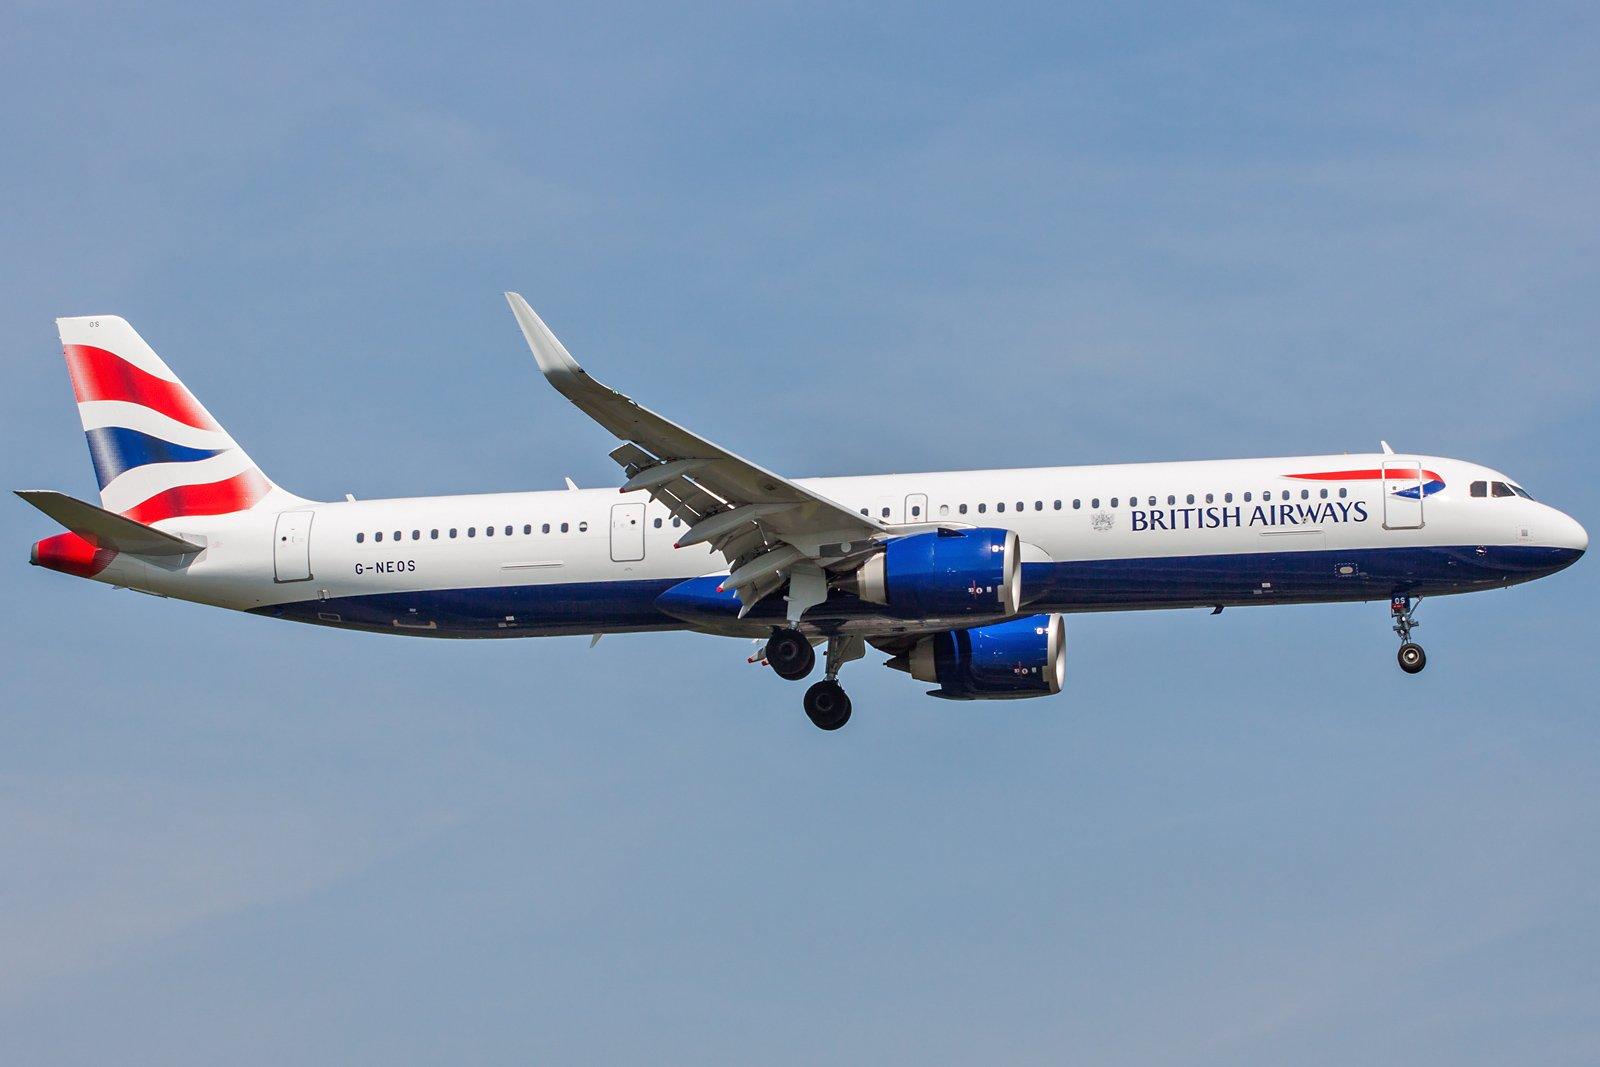 British Airways Airbus A321-251NX G-NEOS